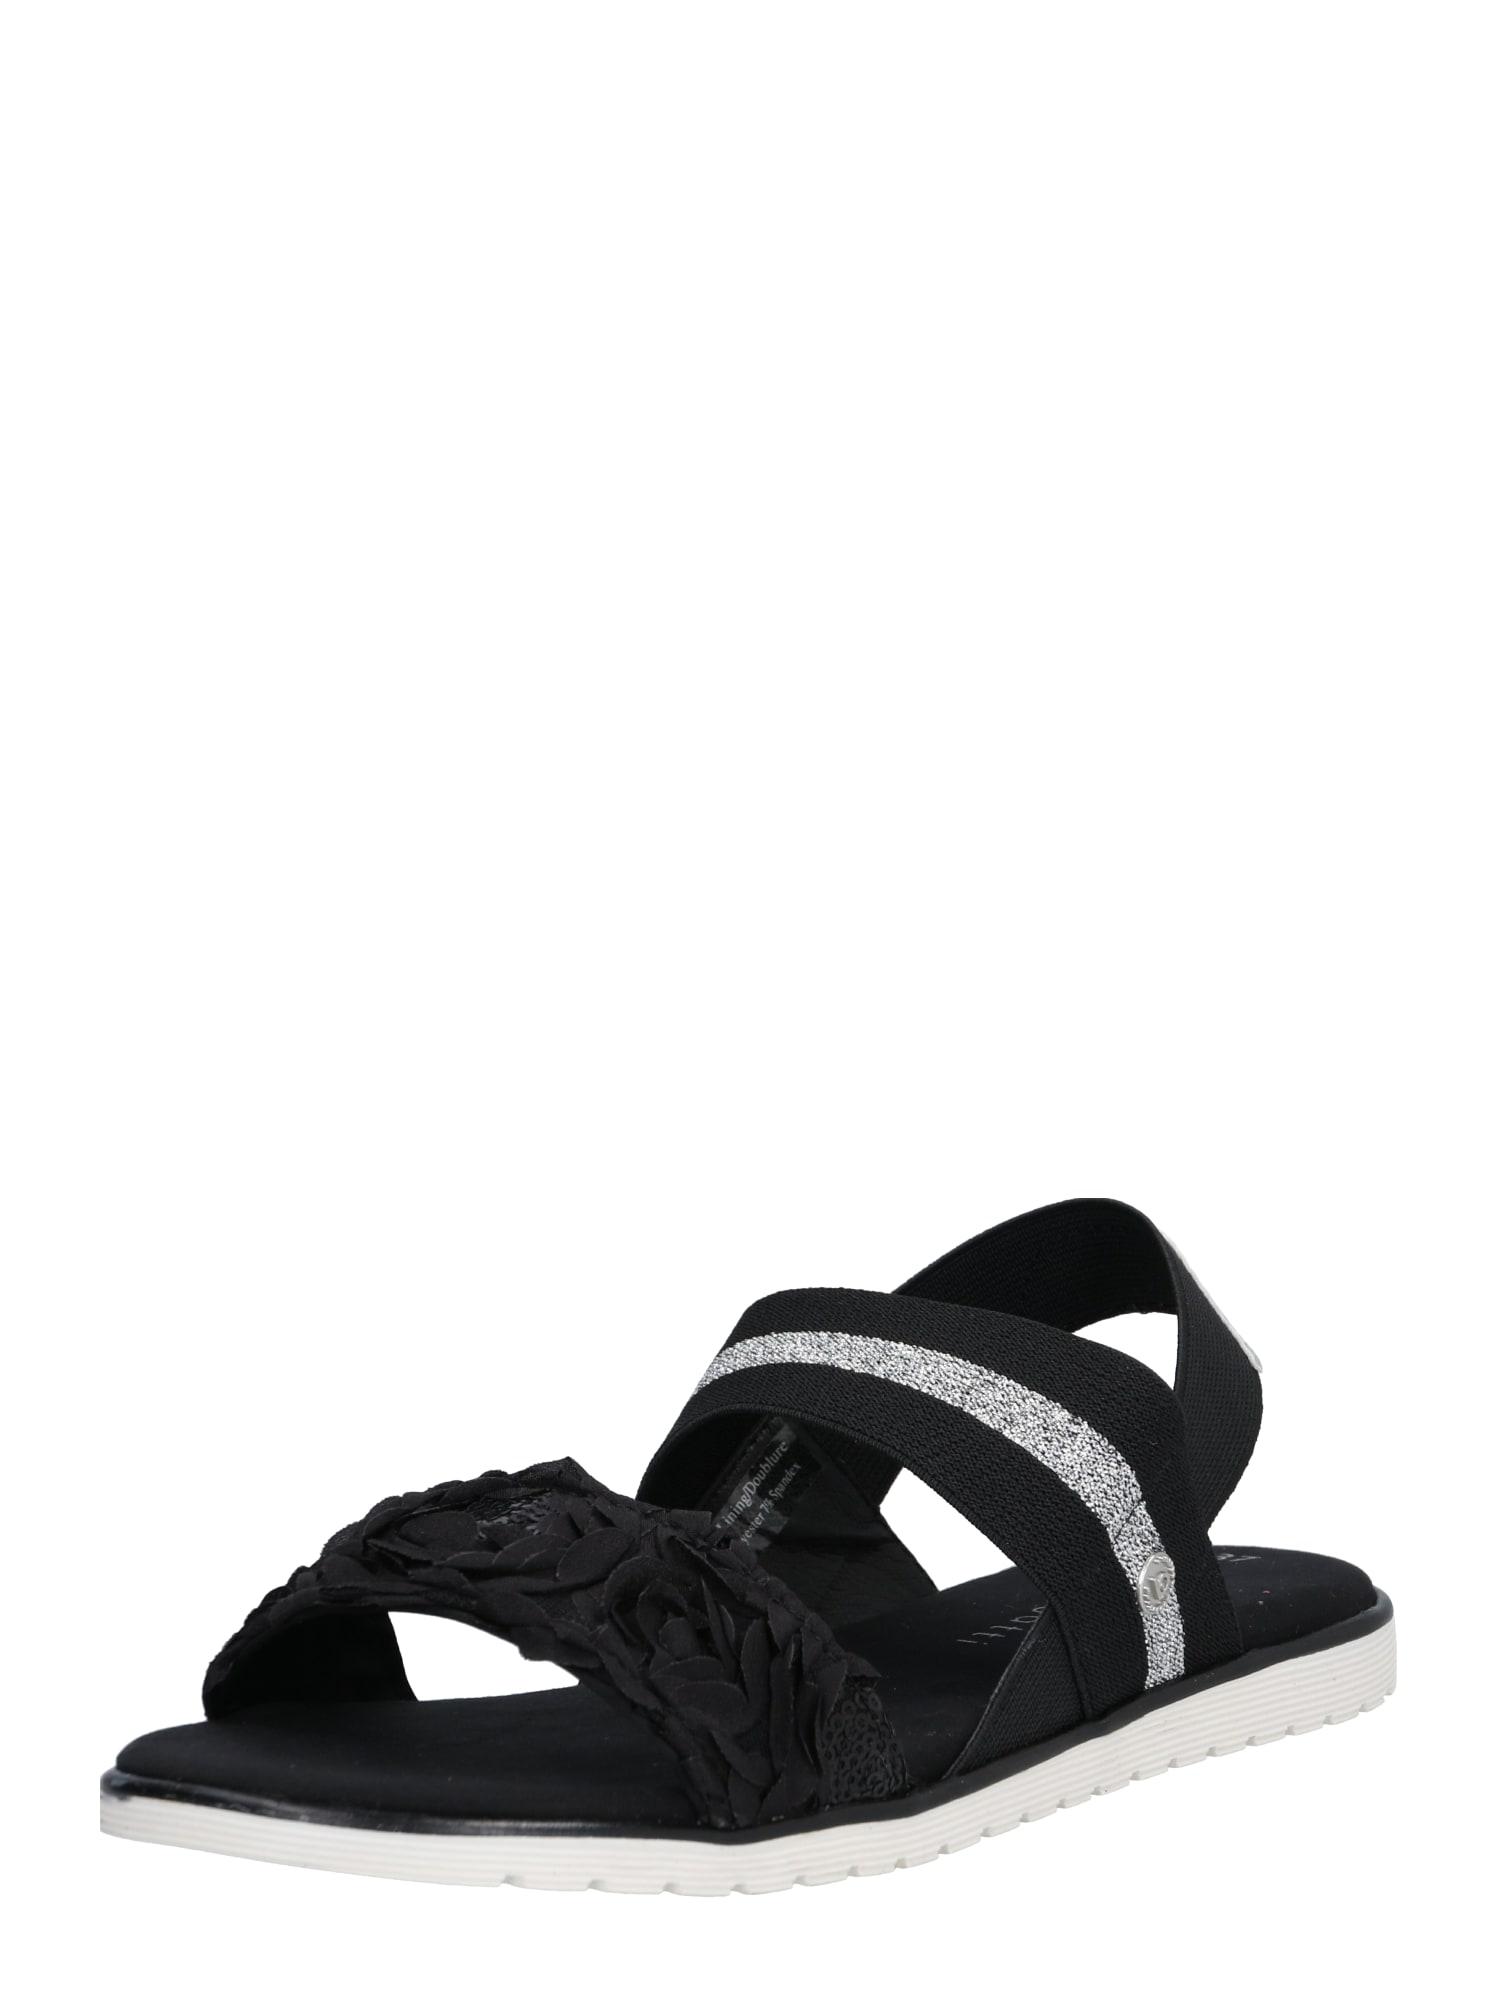 Sandály Joleen černá stříbrná Bugatti